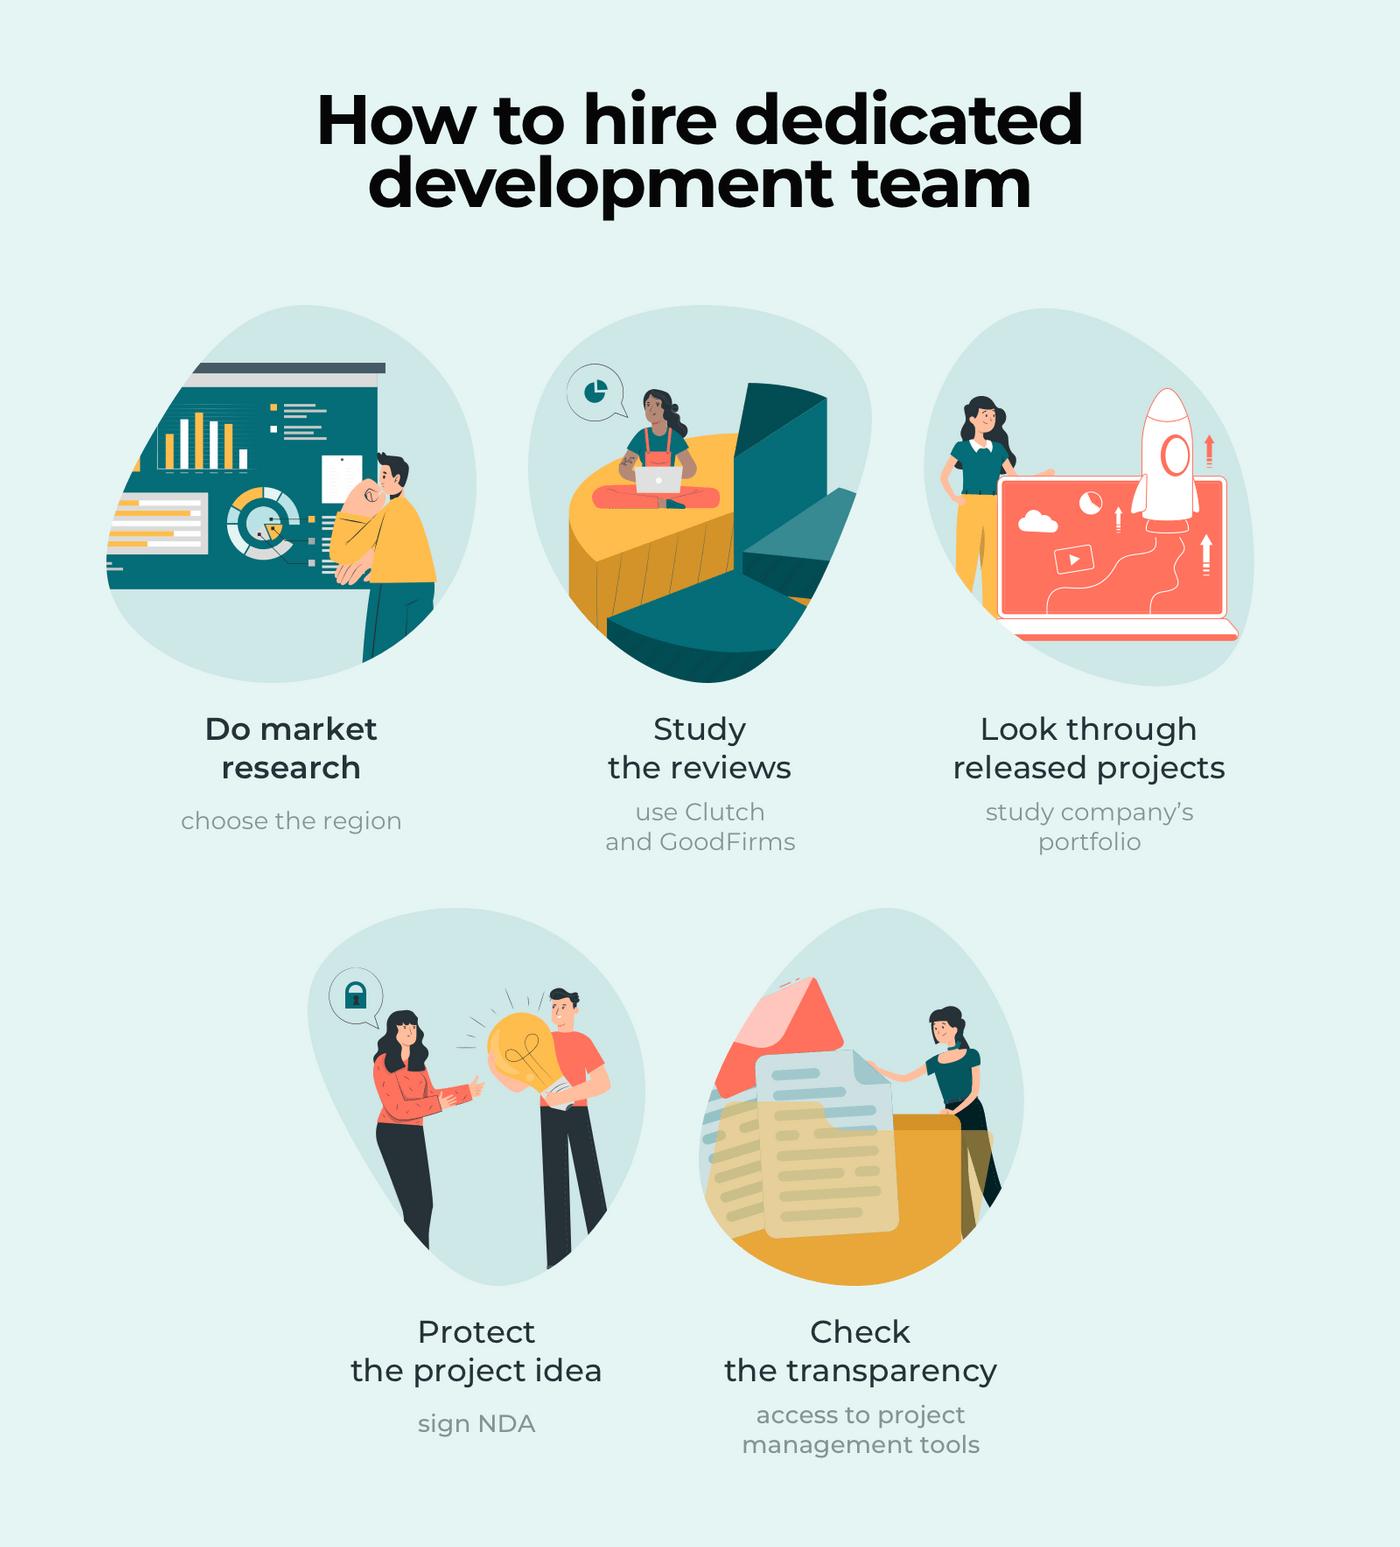 How to hire dedicated development team